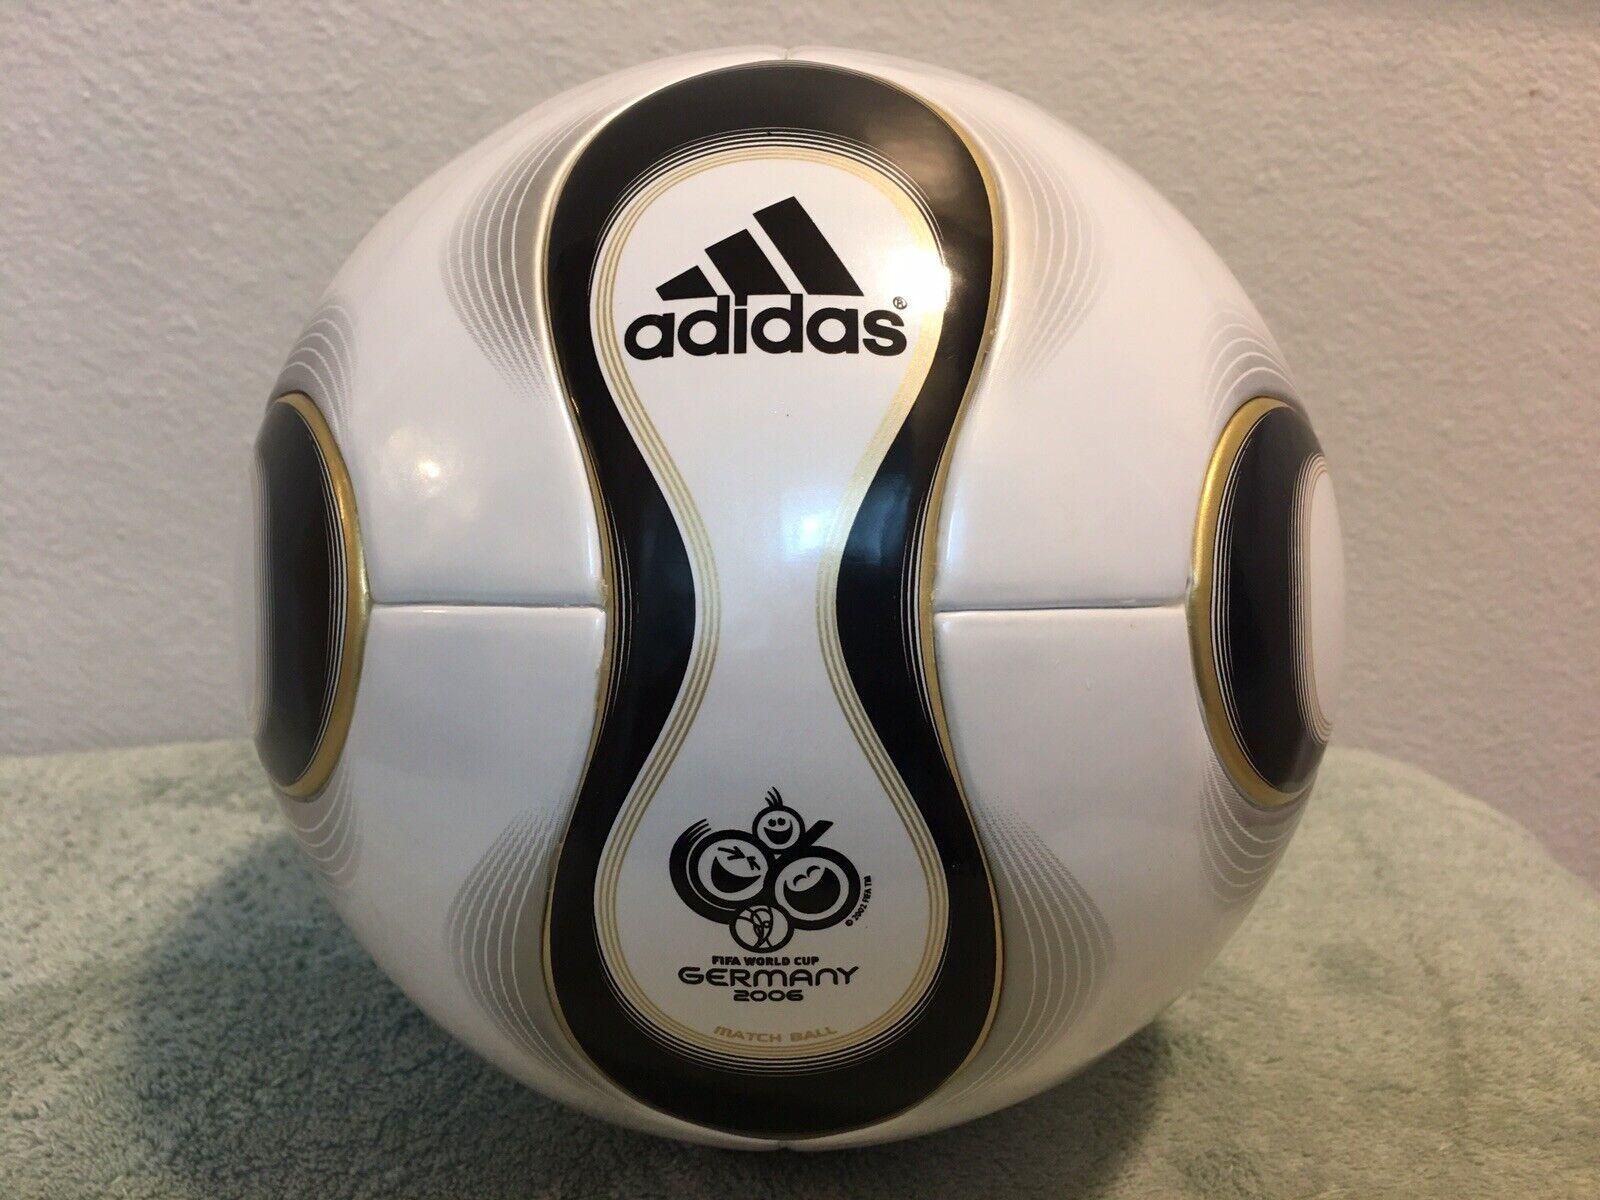 Adidas World Cup 2006 Alemania Teamgeist Match pelota de fútbol Italia